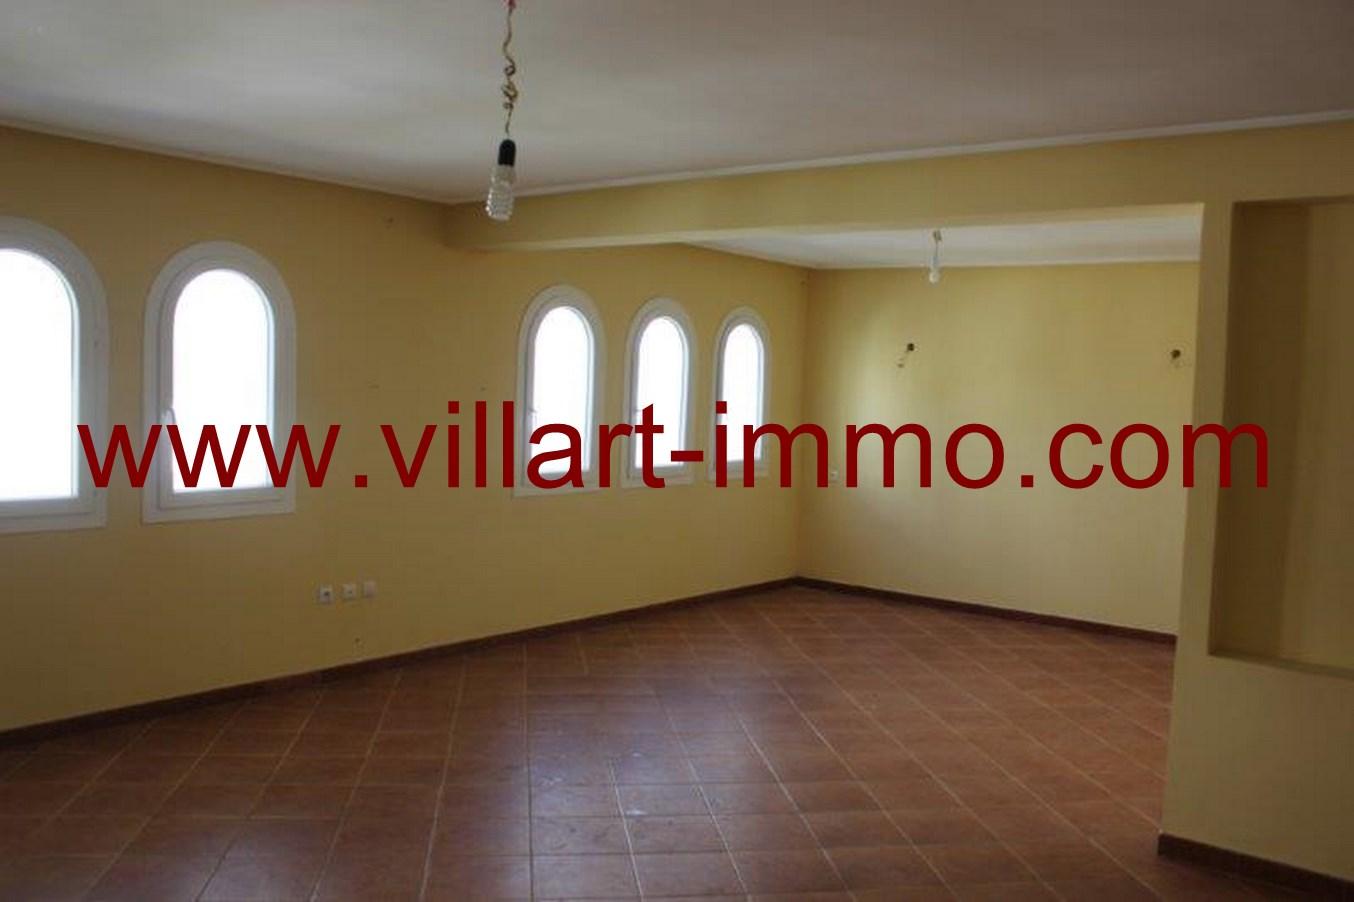 1-a-vendre-appartement-tanger-malabata-salon-va419-villart-immo-agence-immobiliere